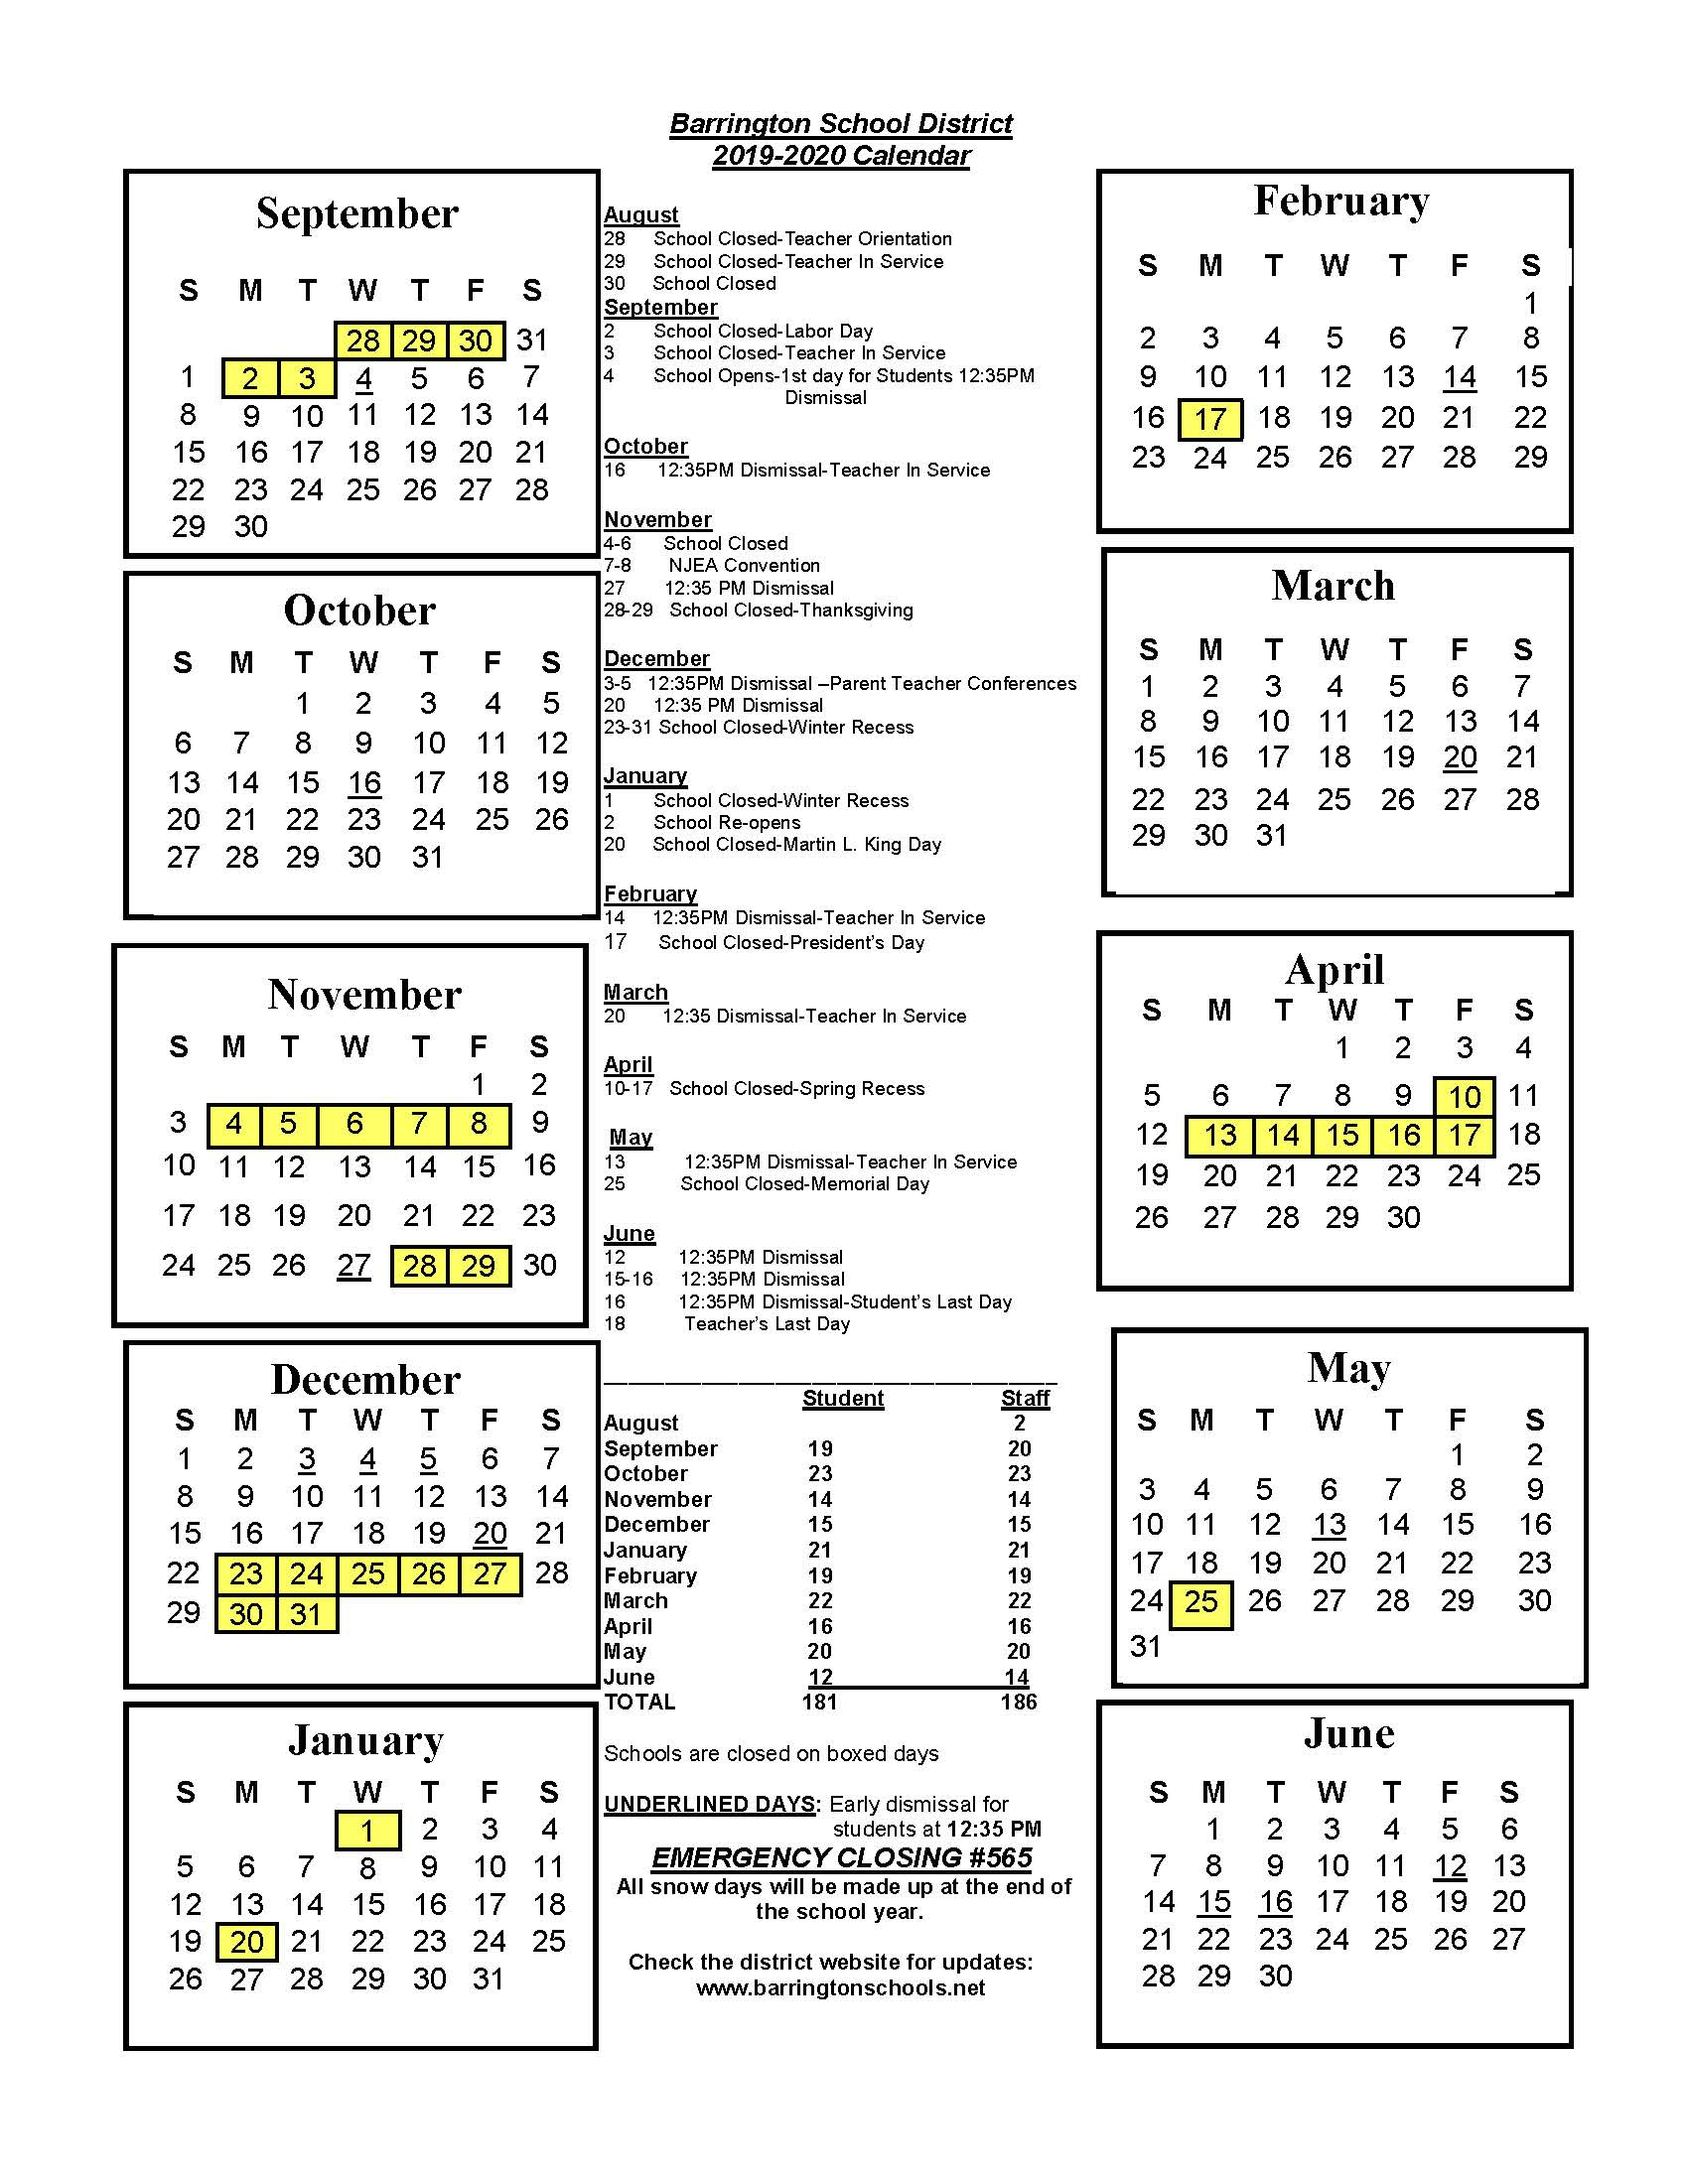 District Calendar - Barrington School District Regarding Cherry Hill Public Schools Calendar